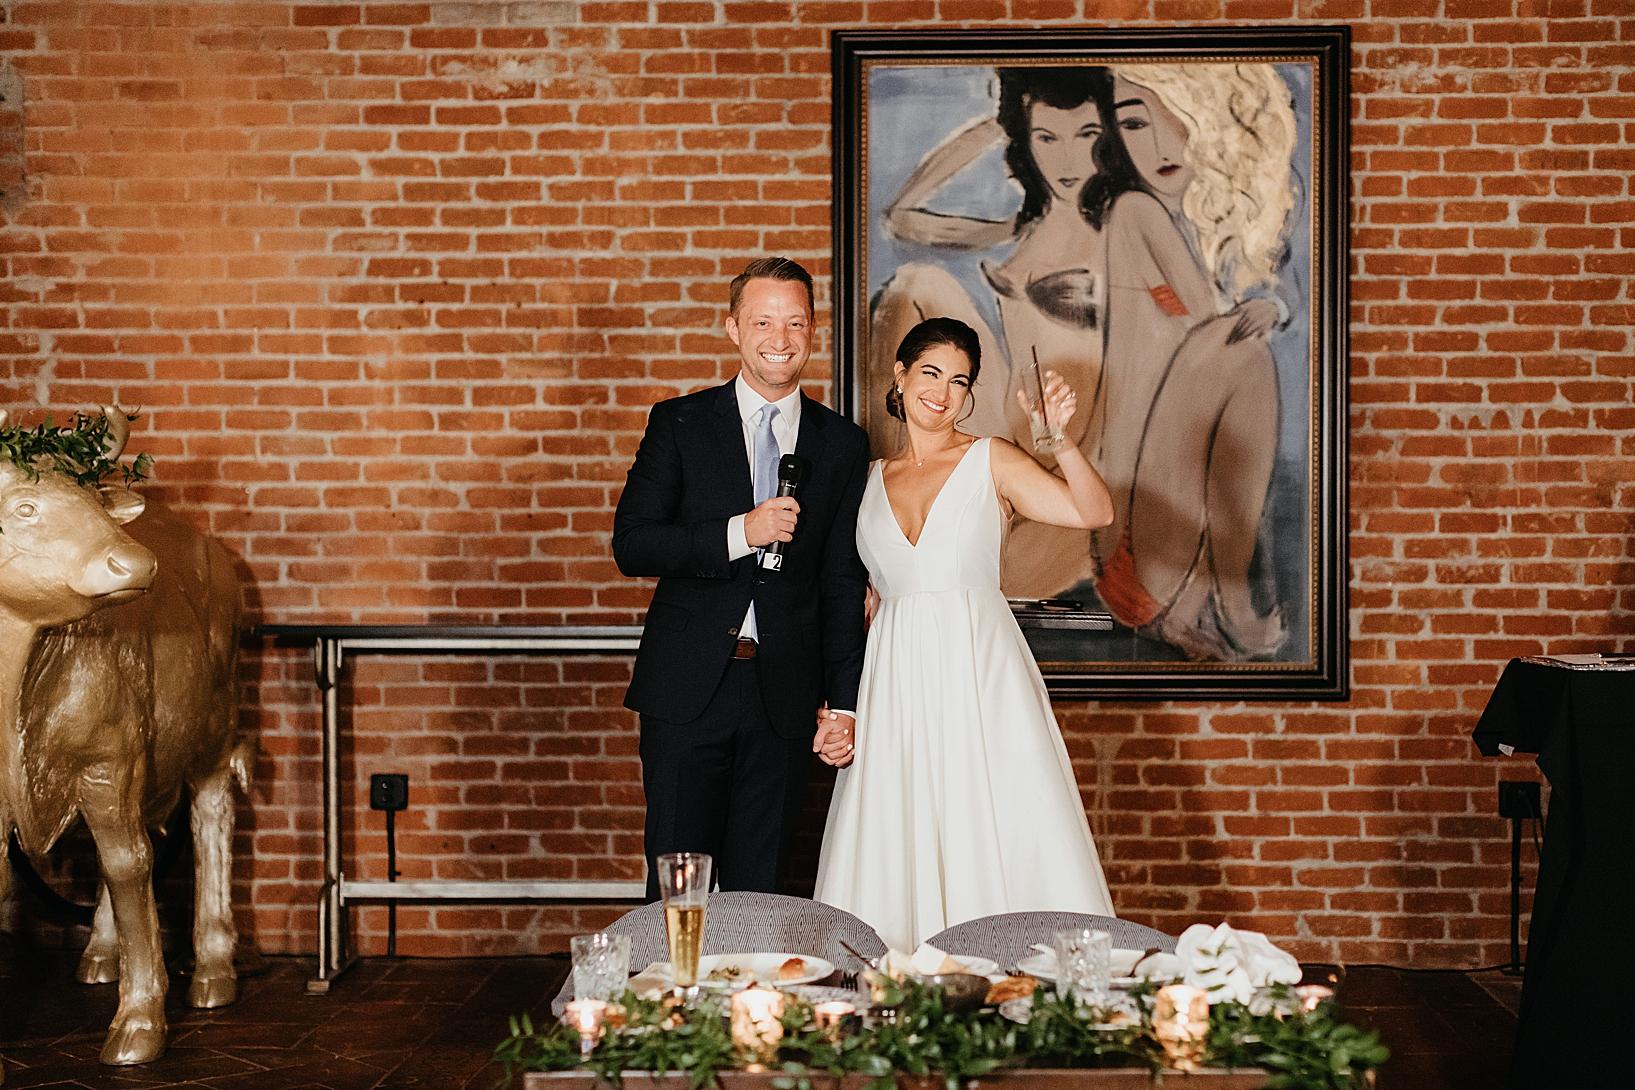 Herb-and-Wood-Wedding-104.jpg